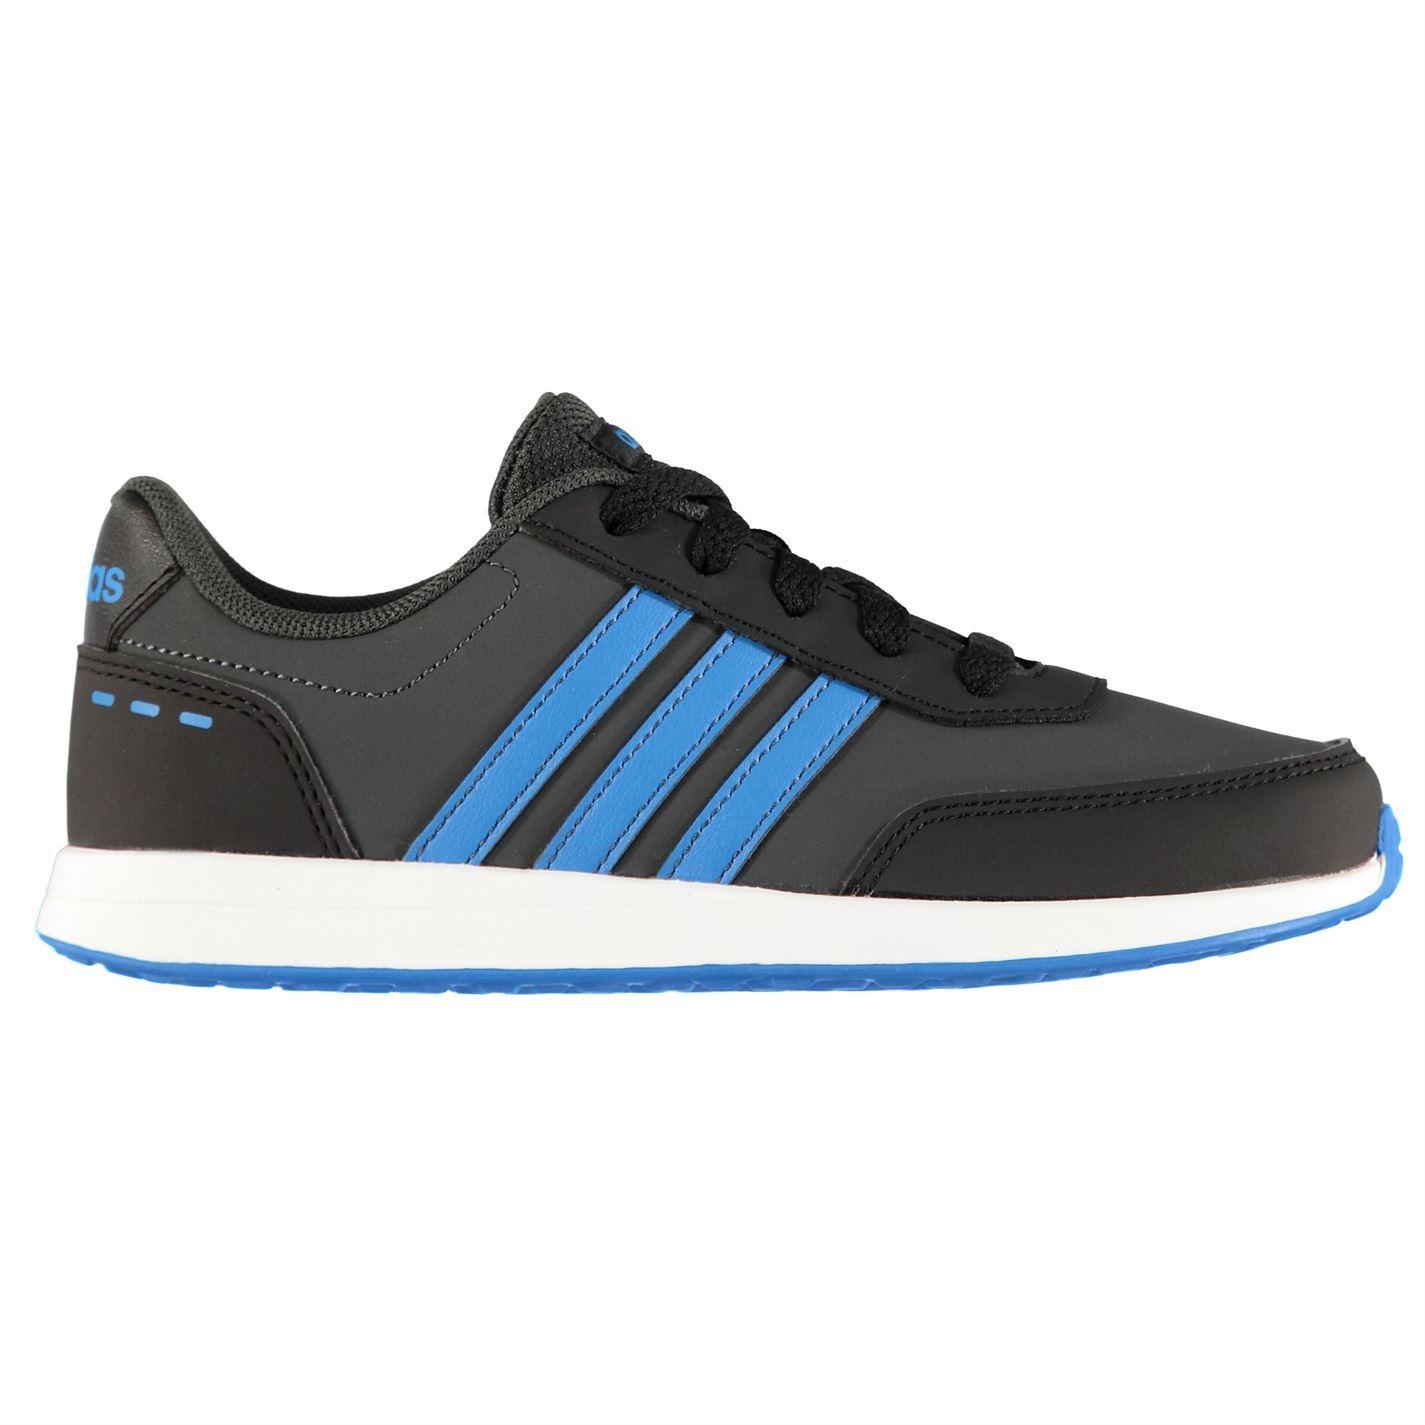 miniatura 13 - ADIDAS-Switch-Nubuck-Scarpe-da-ginnastica-bambino-ragazzo-calzature